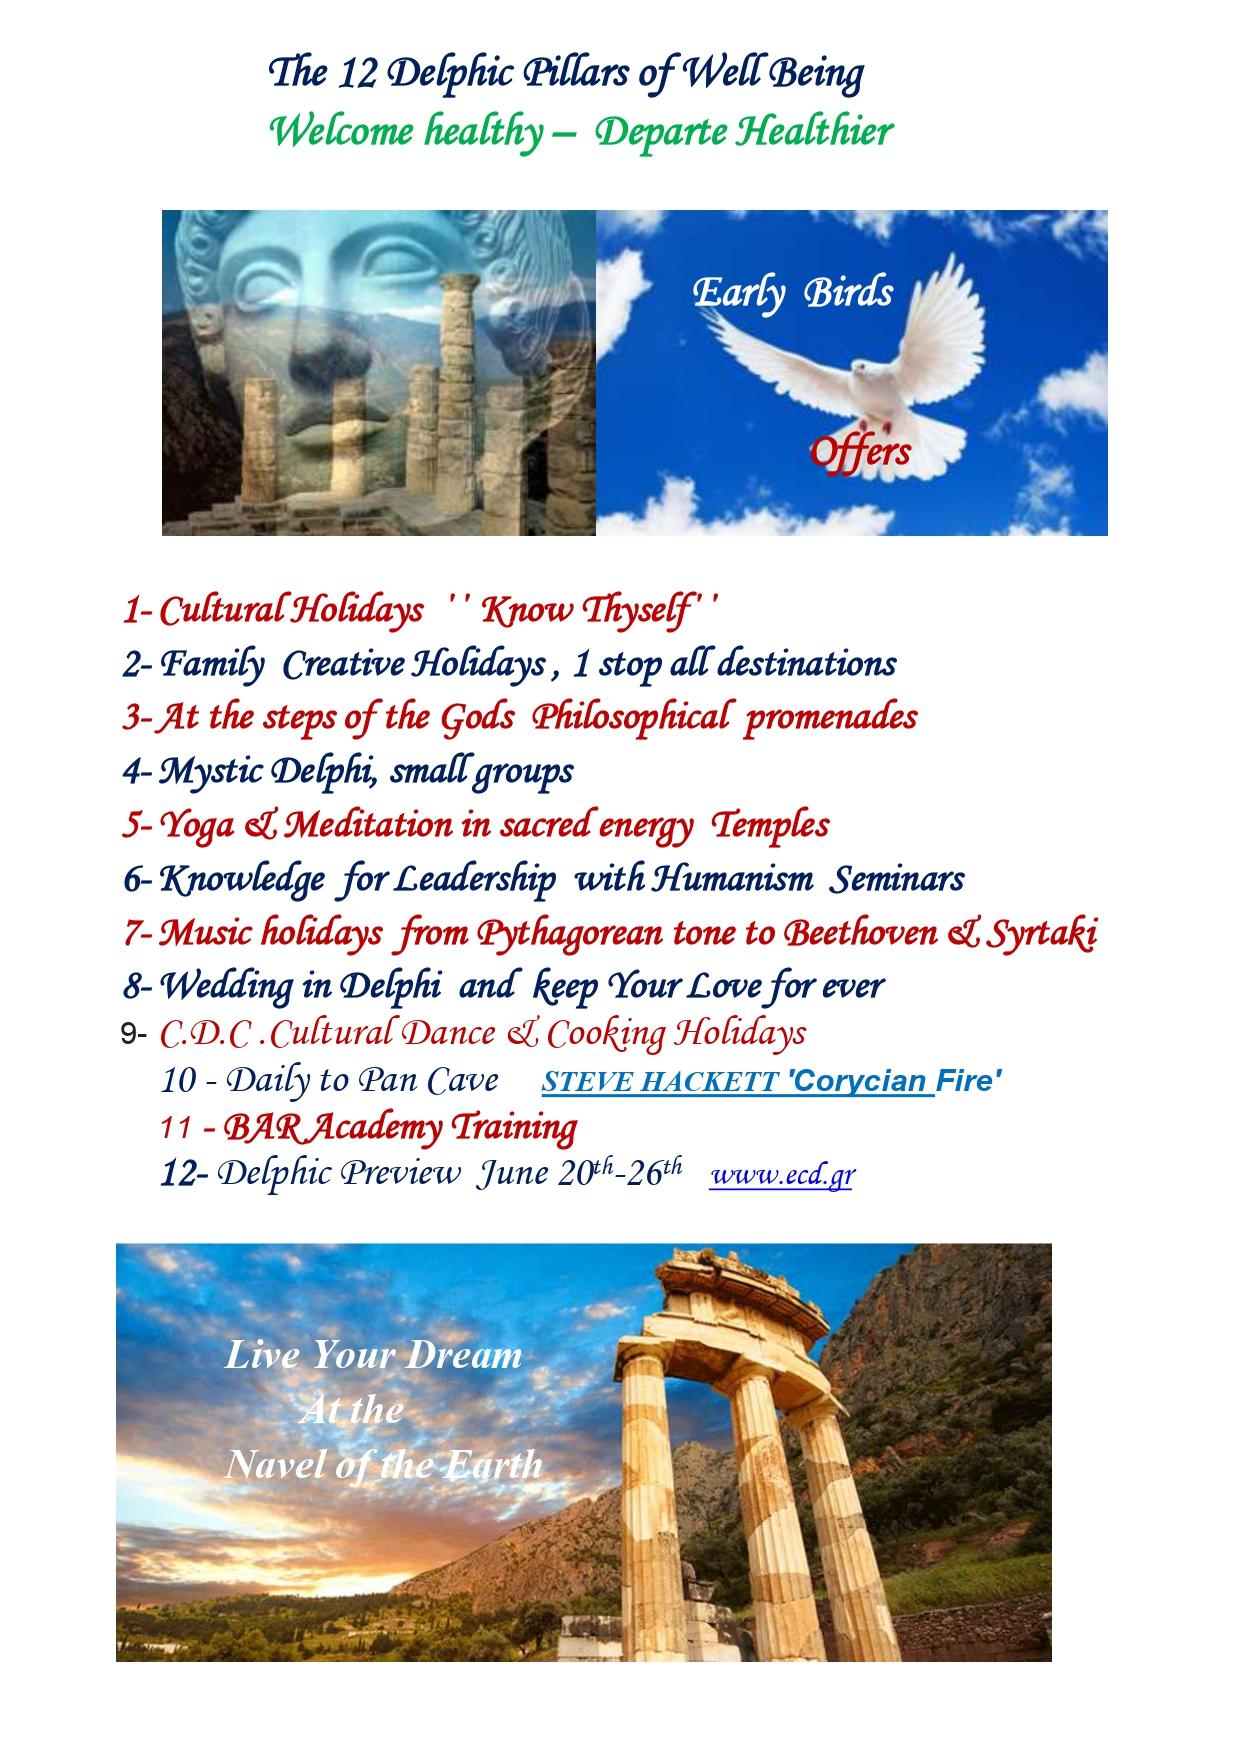 12 Delphic Pillars